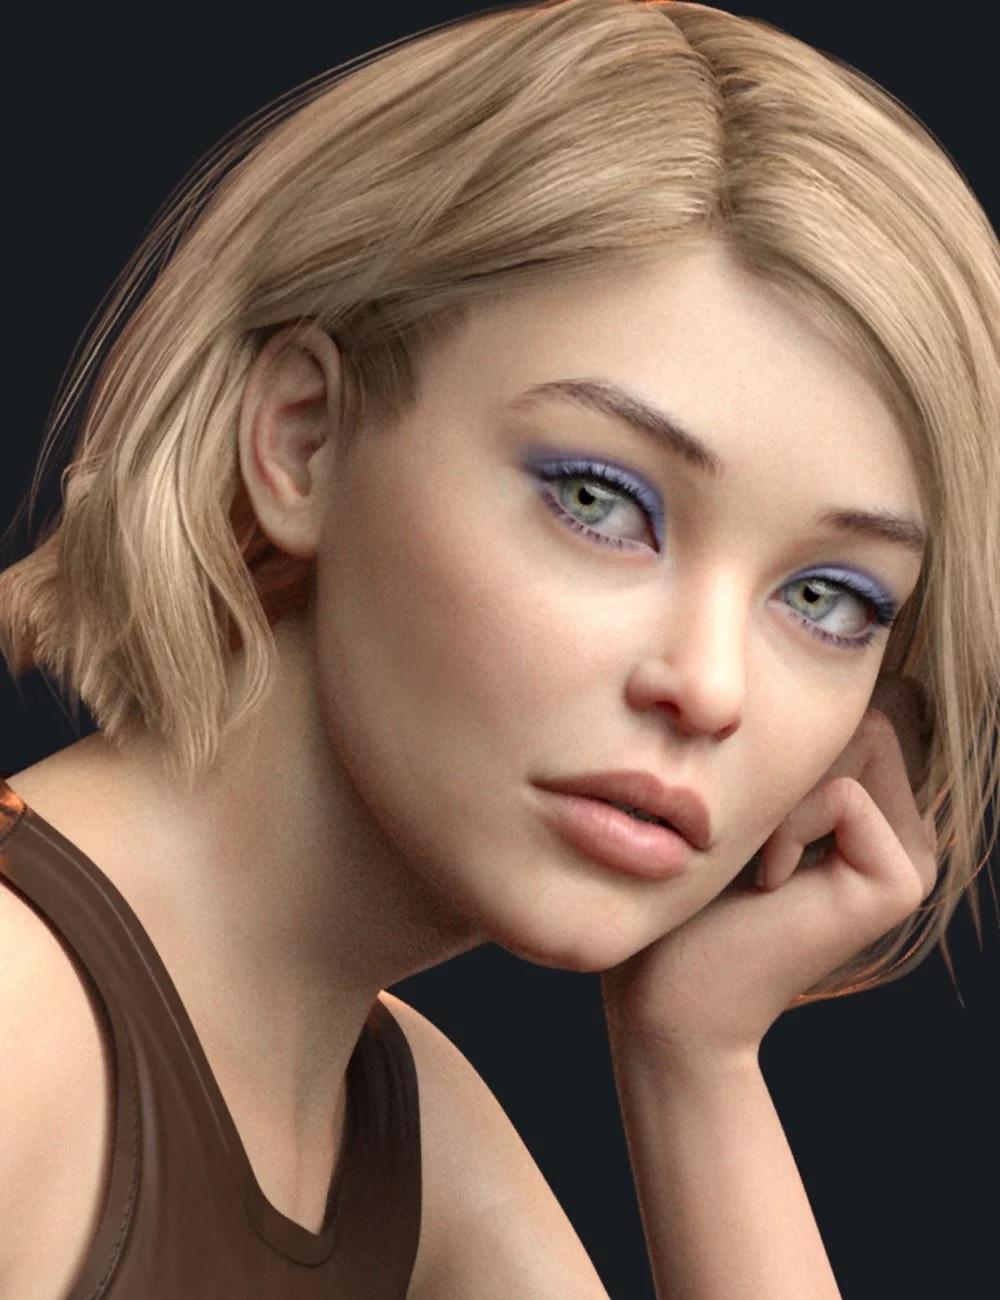 Millarose for Genesis 8 Female